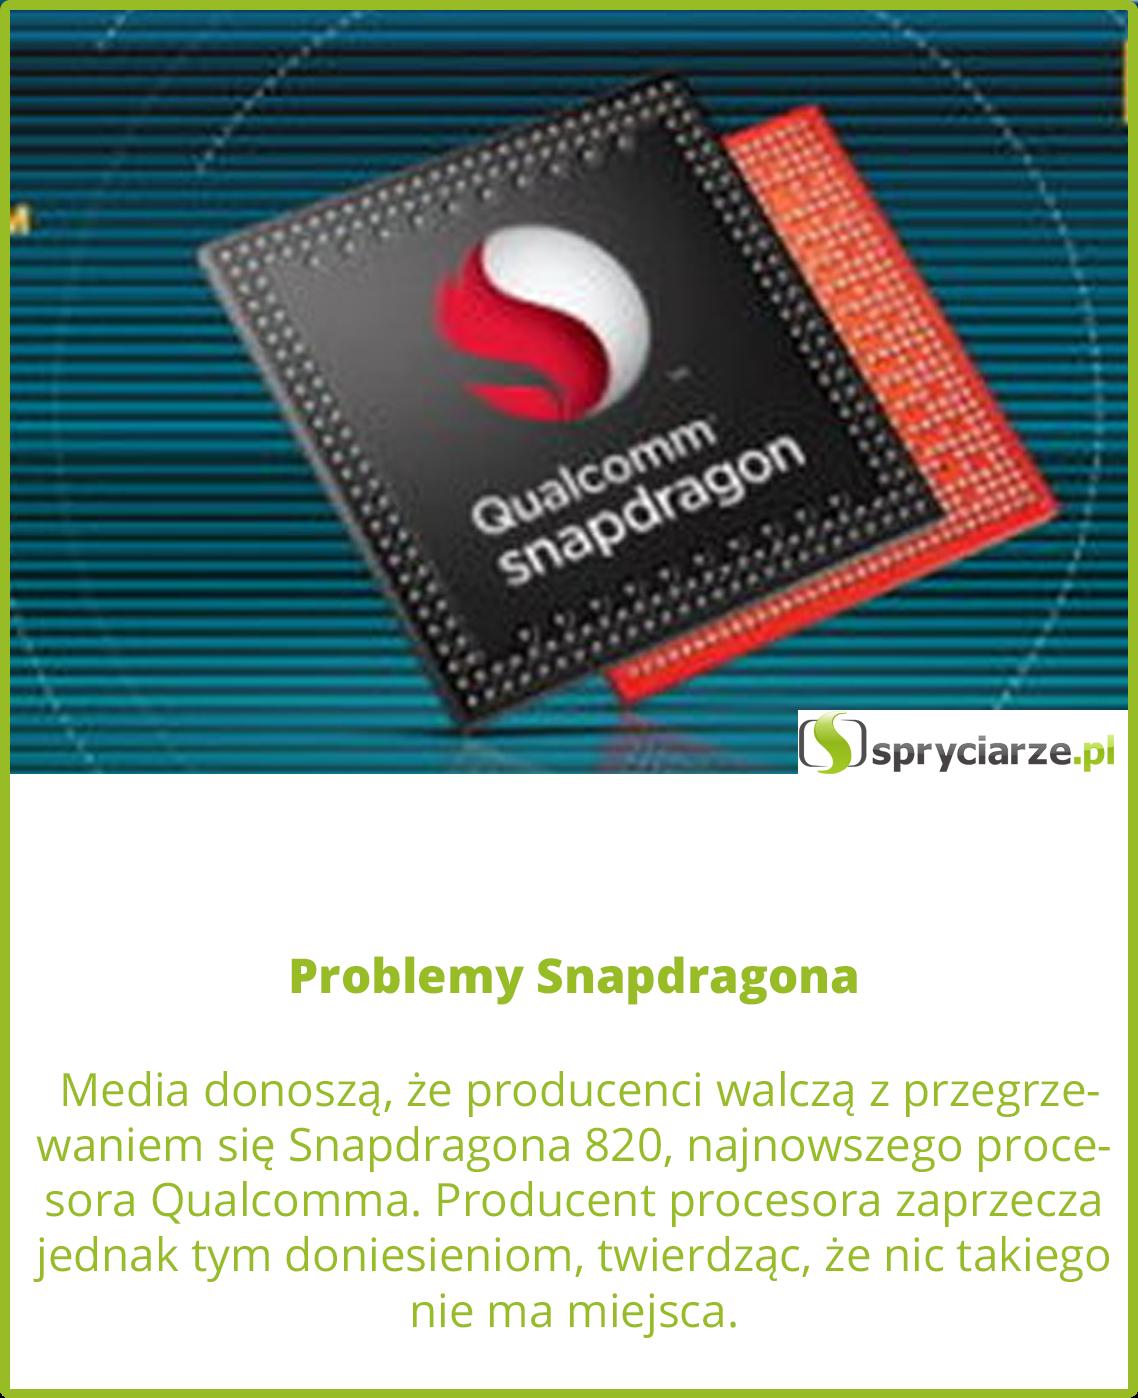 Problemy Snapdragona